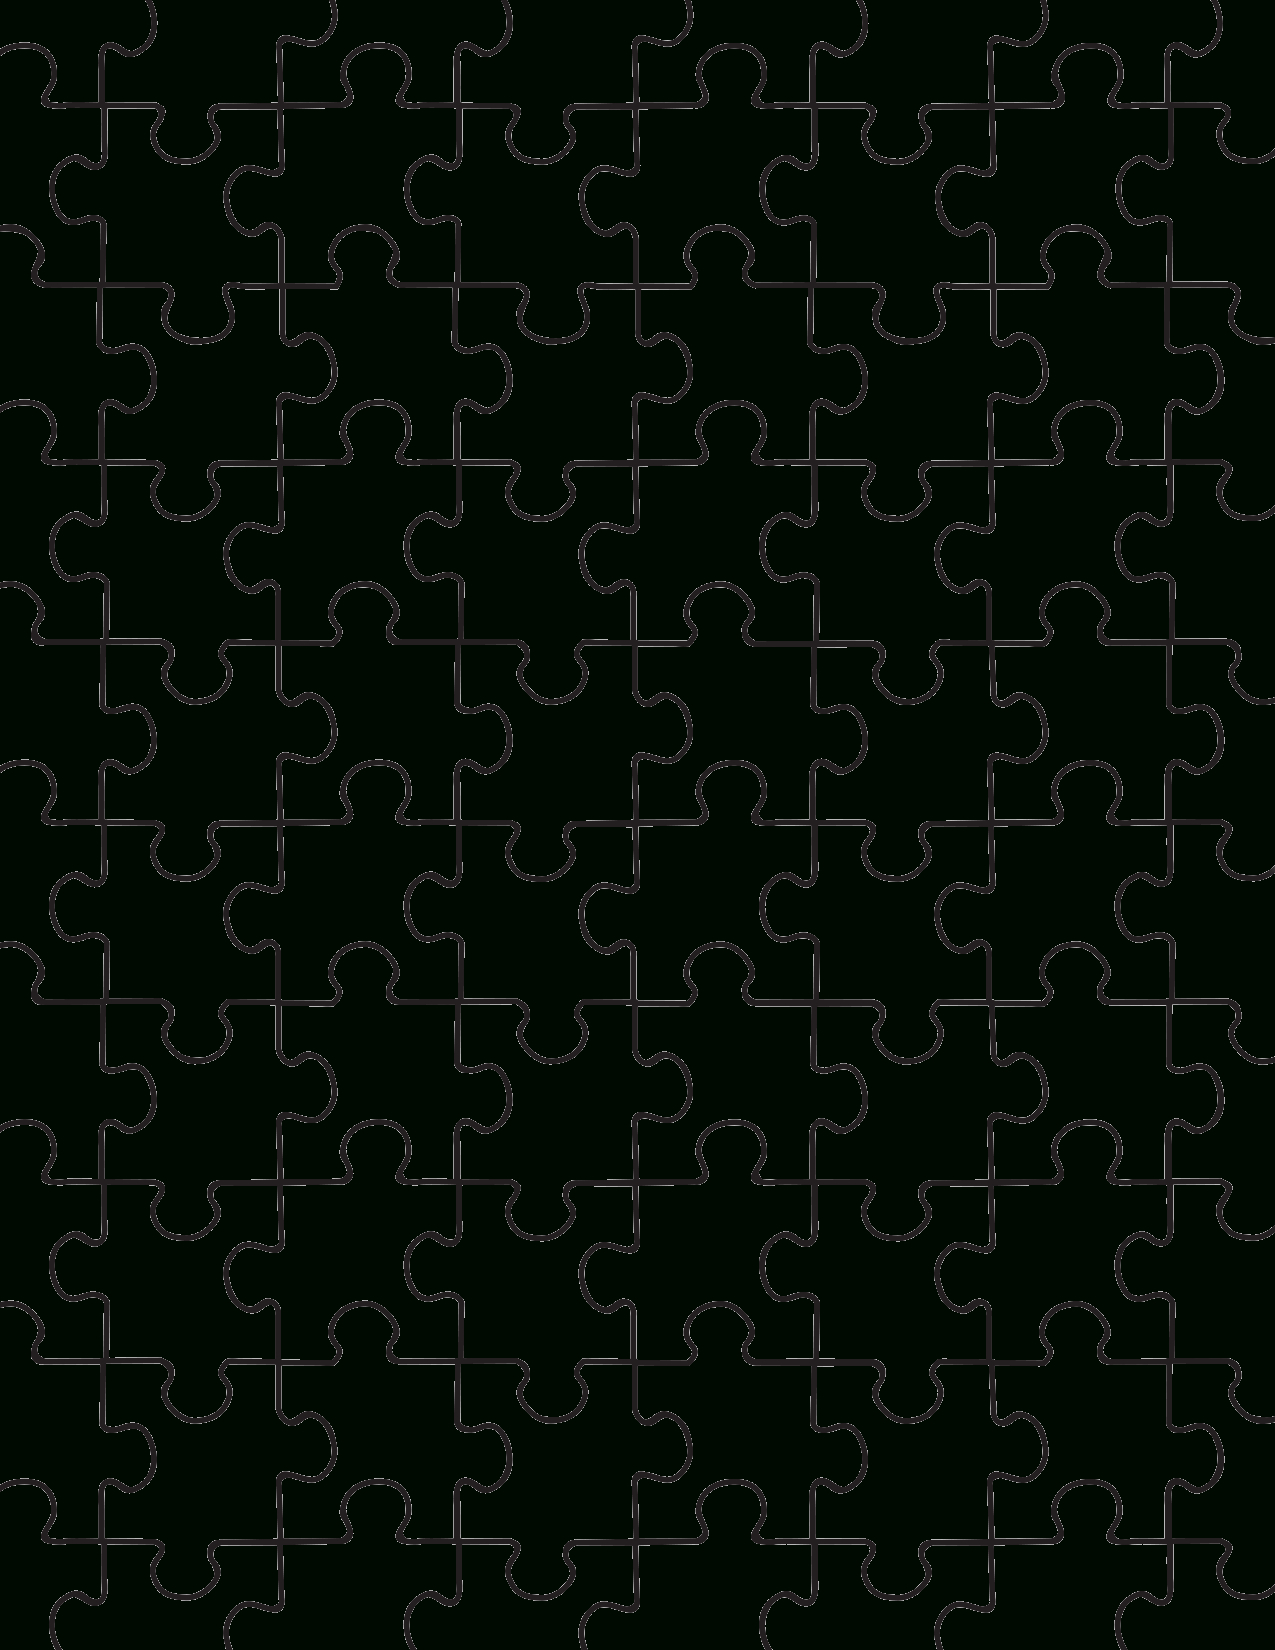 Printable Puzzle Pieces Template | Lovetoknow - Printable Puzzle Pictures